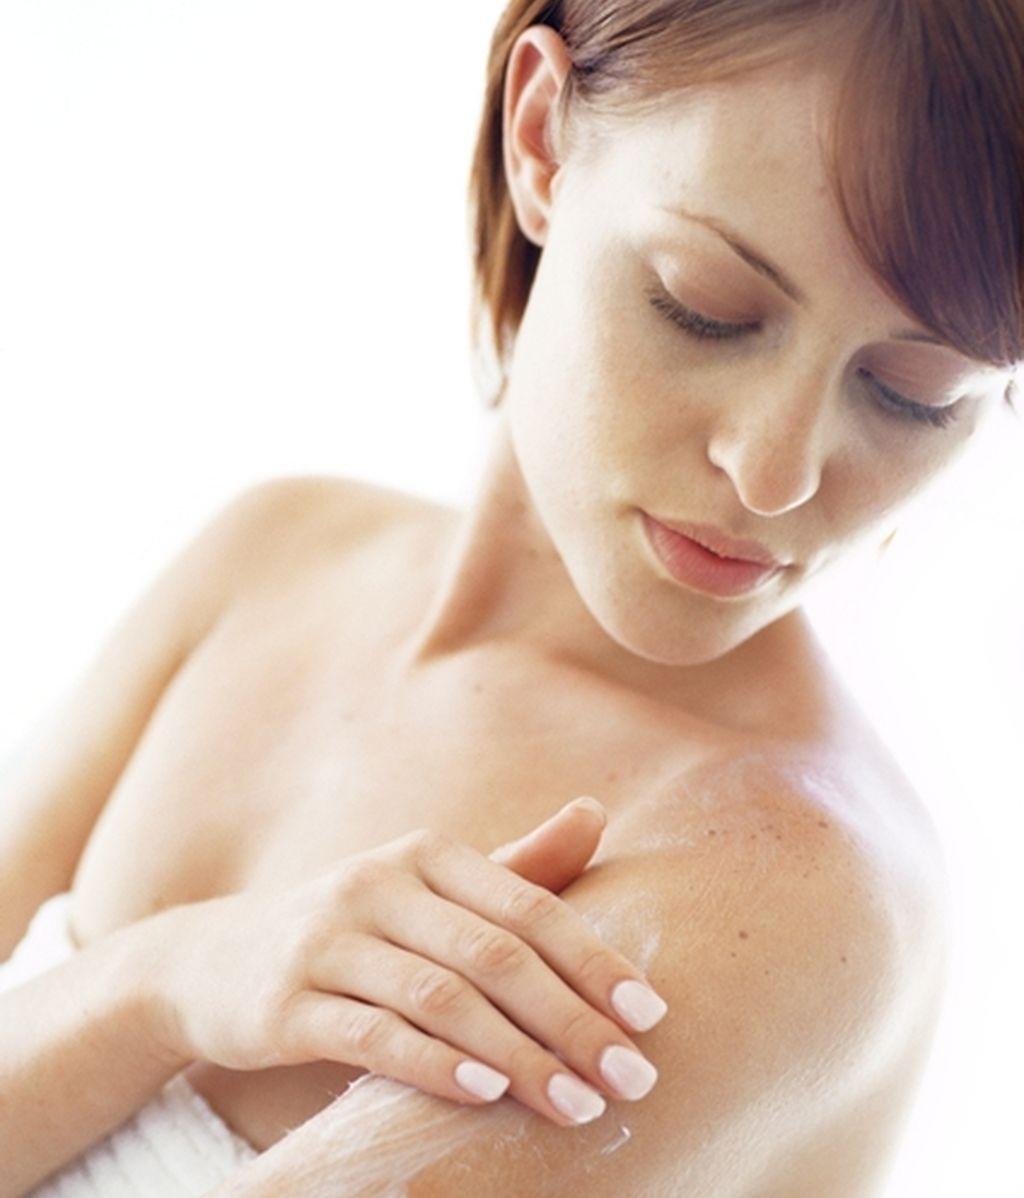 Mujer echándose crema